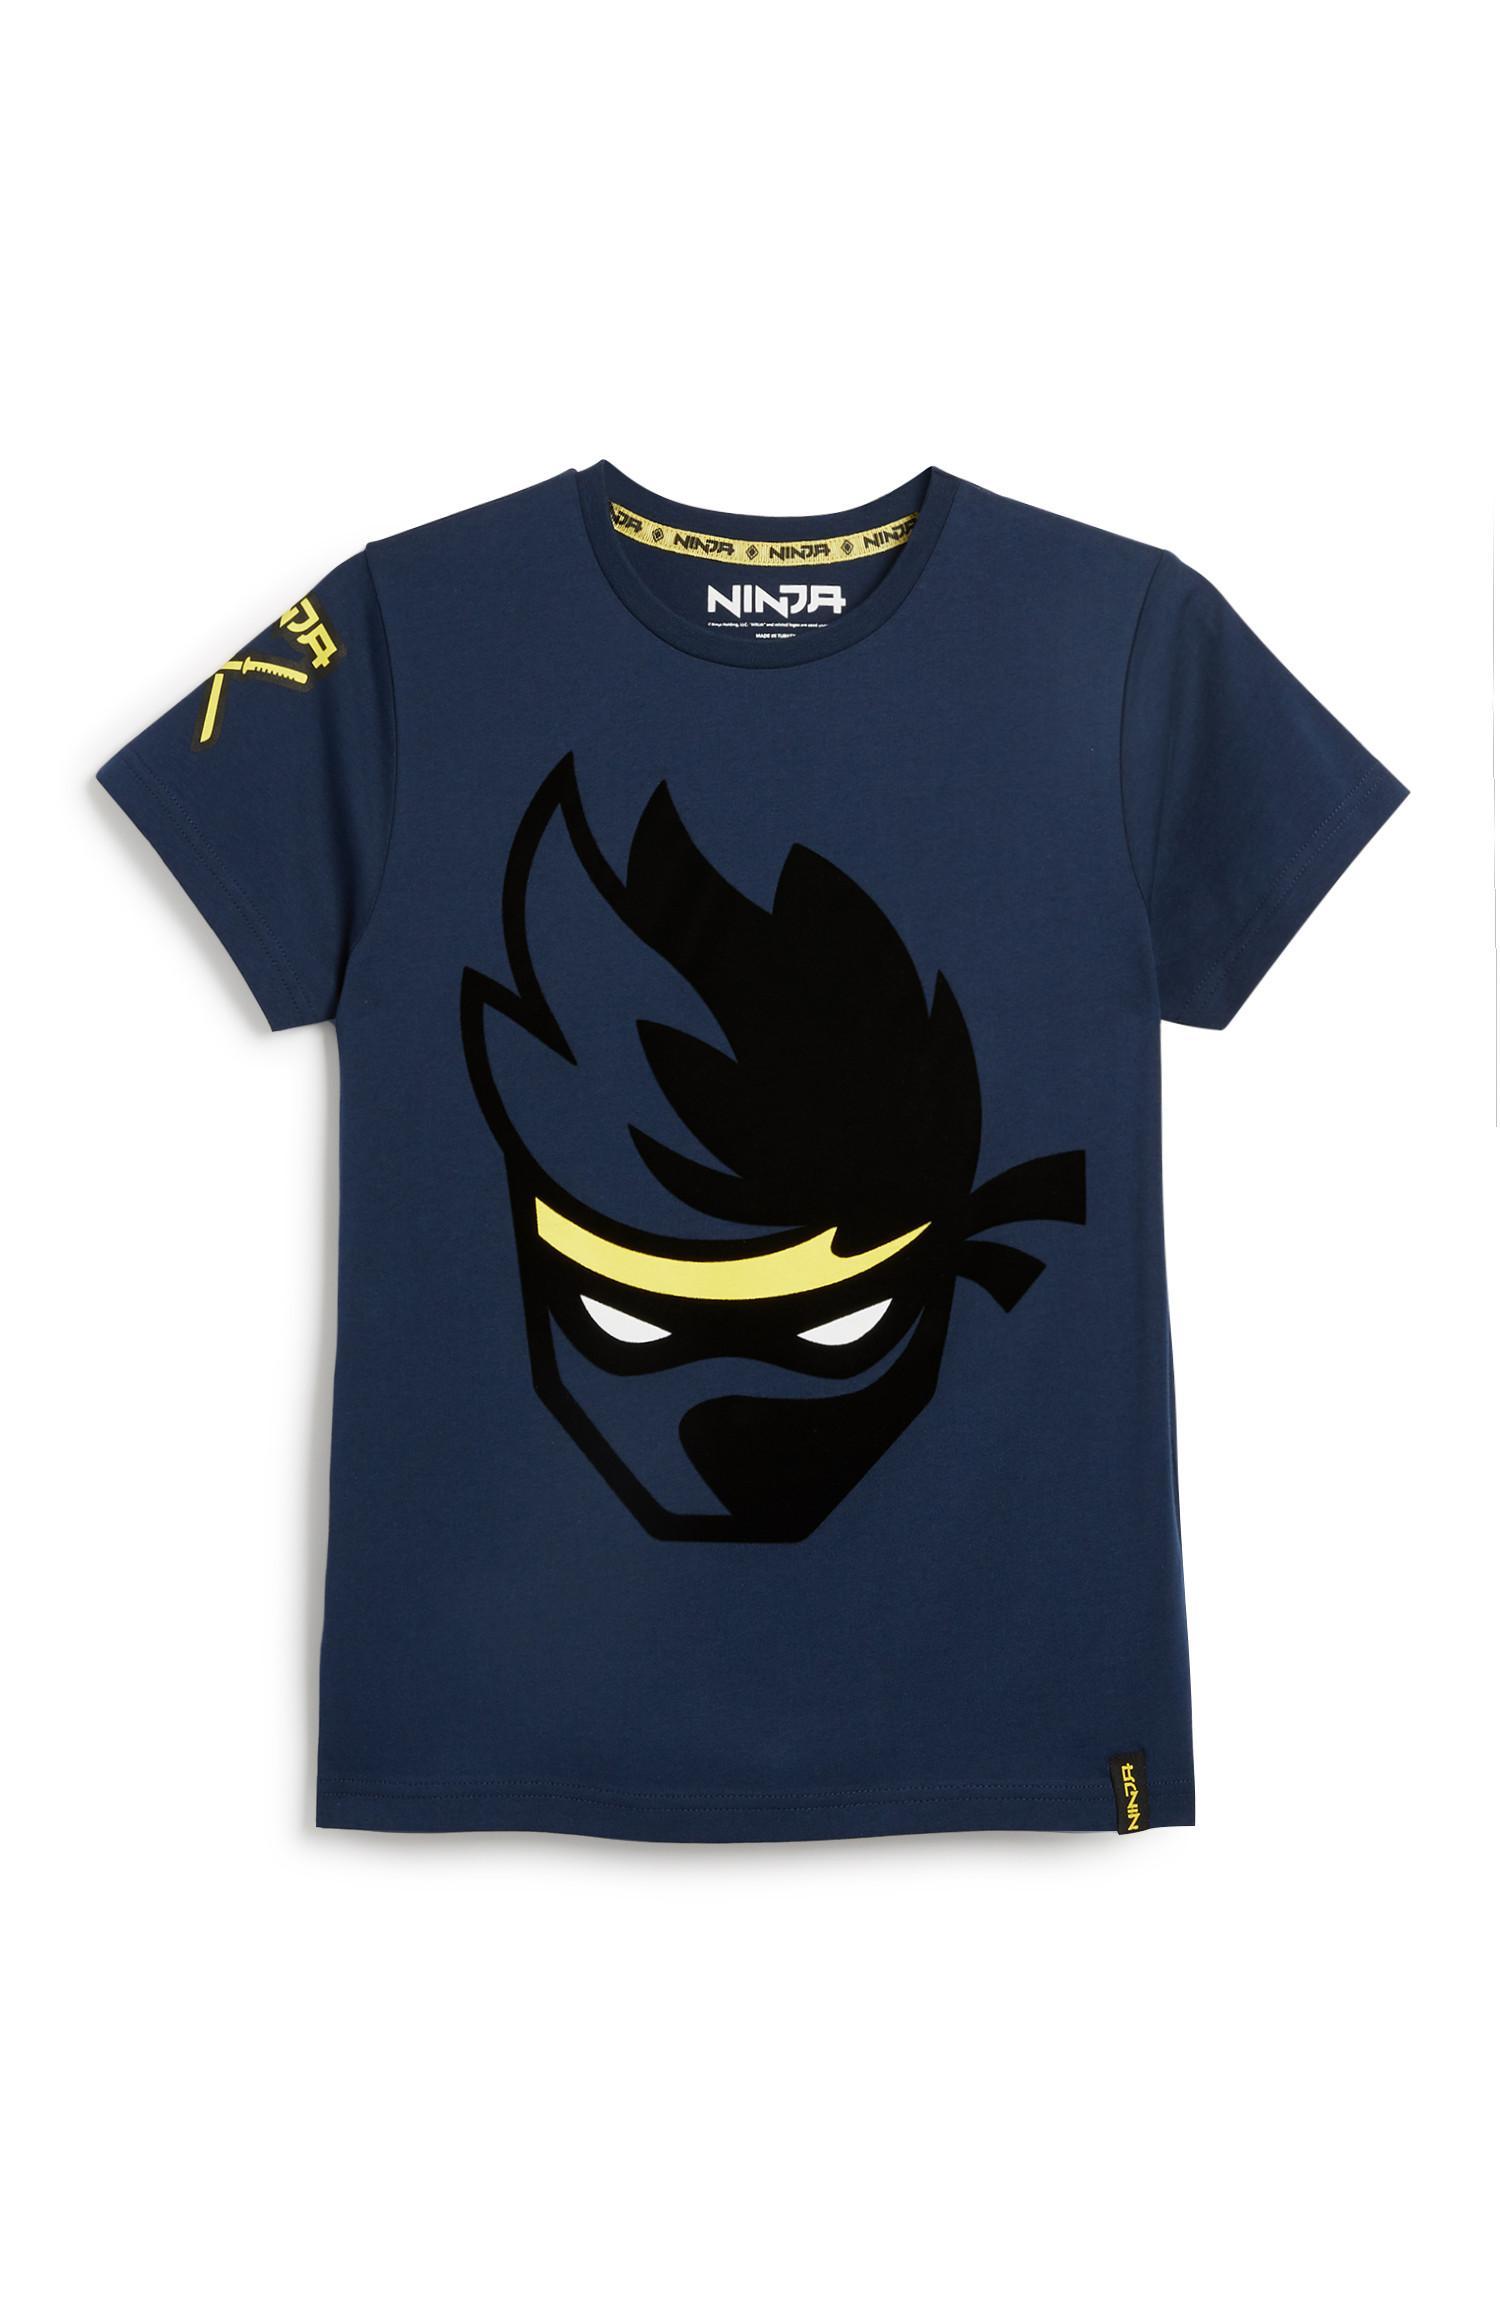 T-shirt Ninja azul-marinho